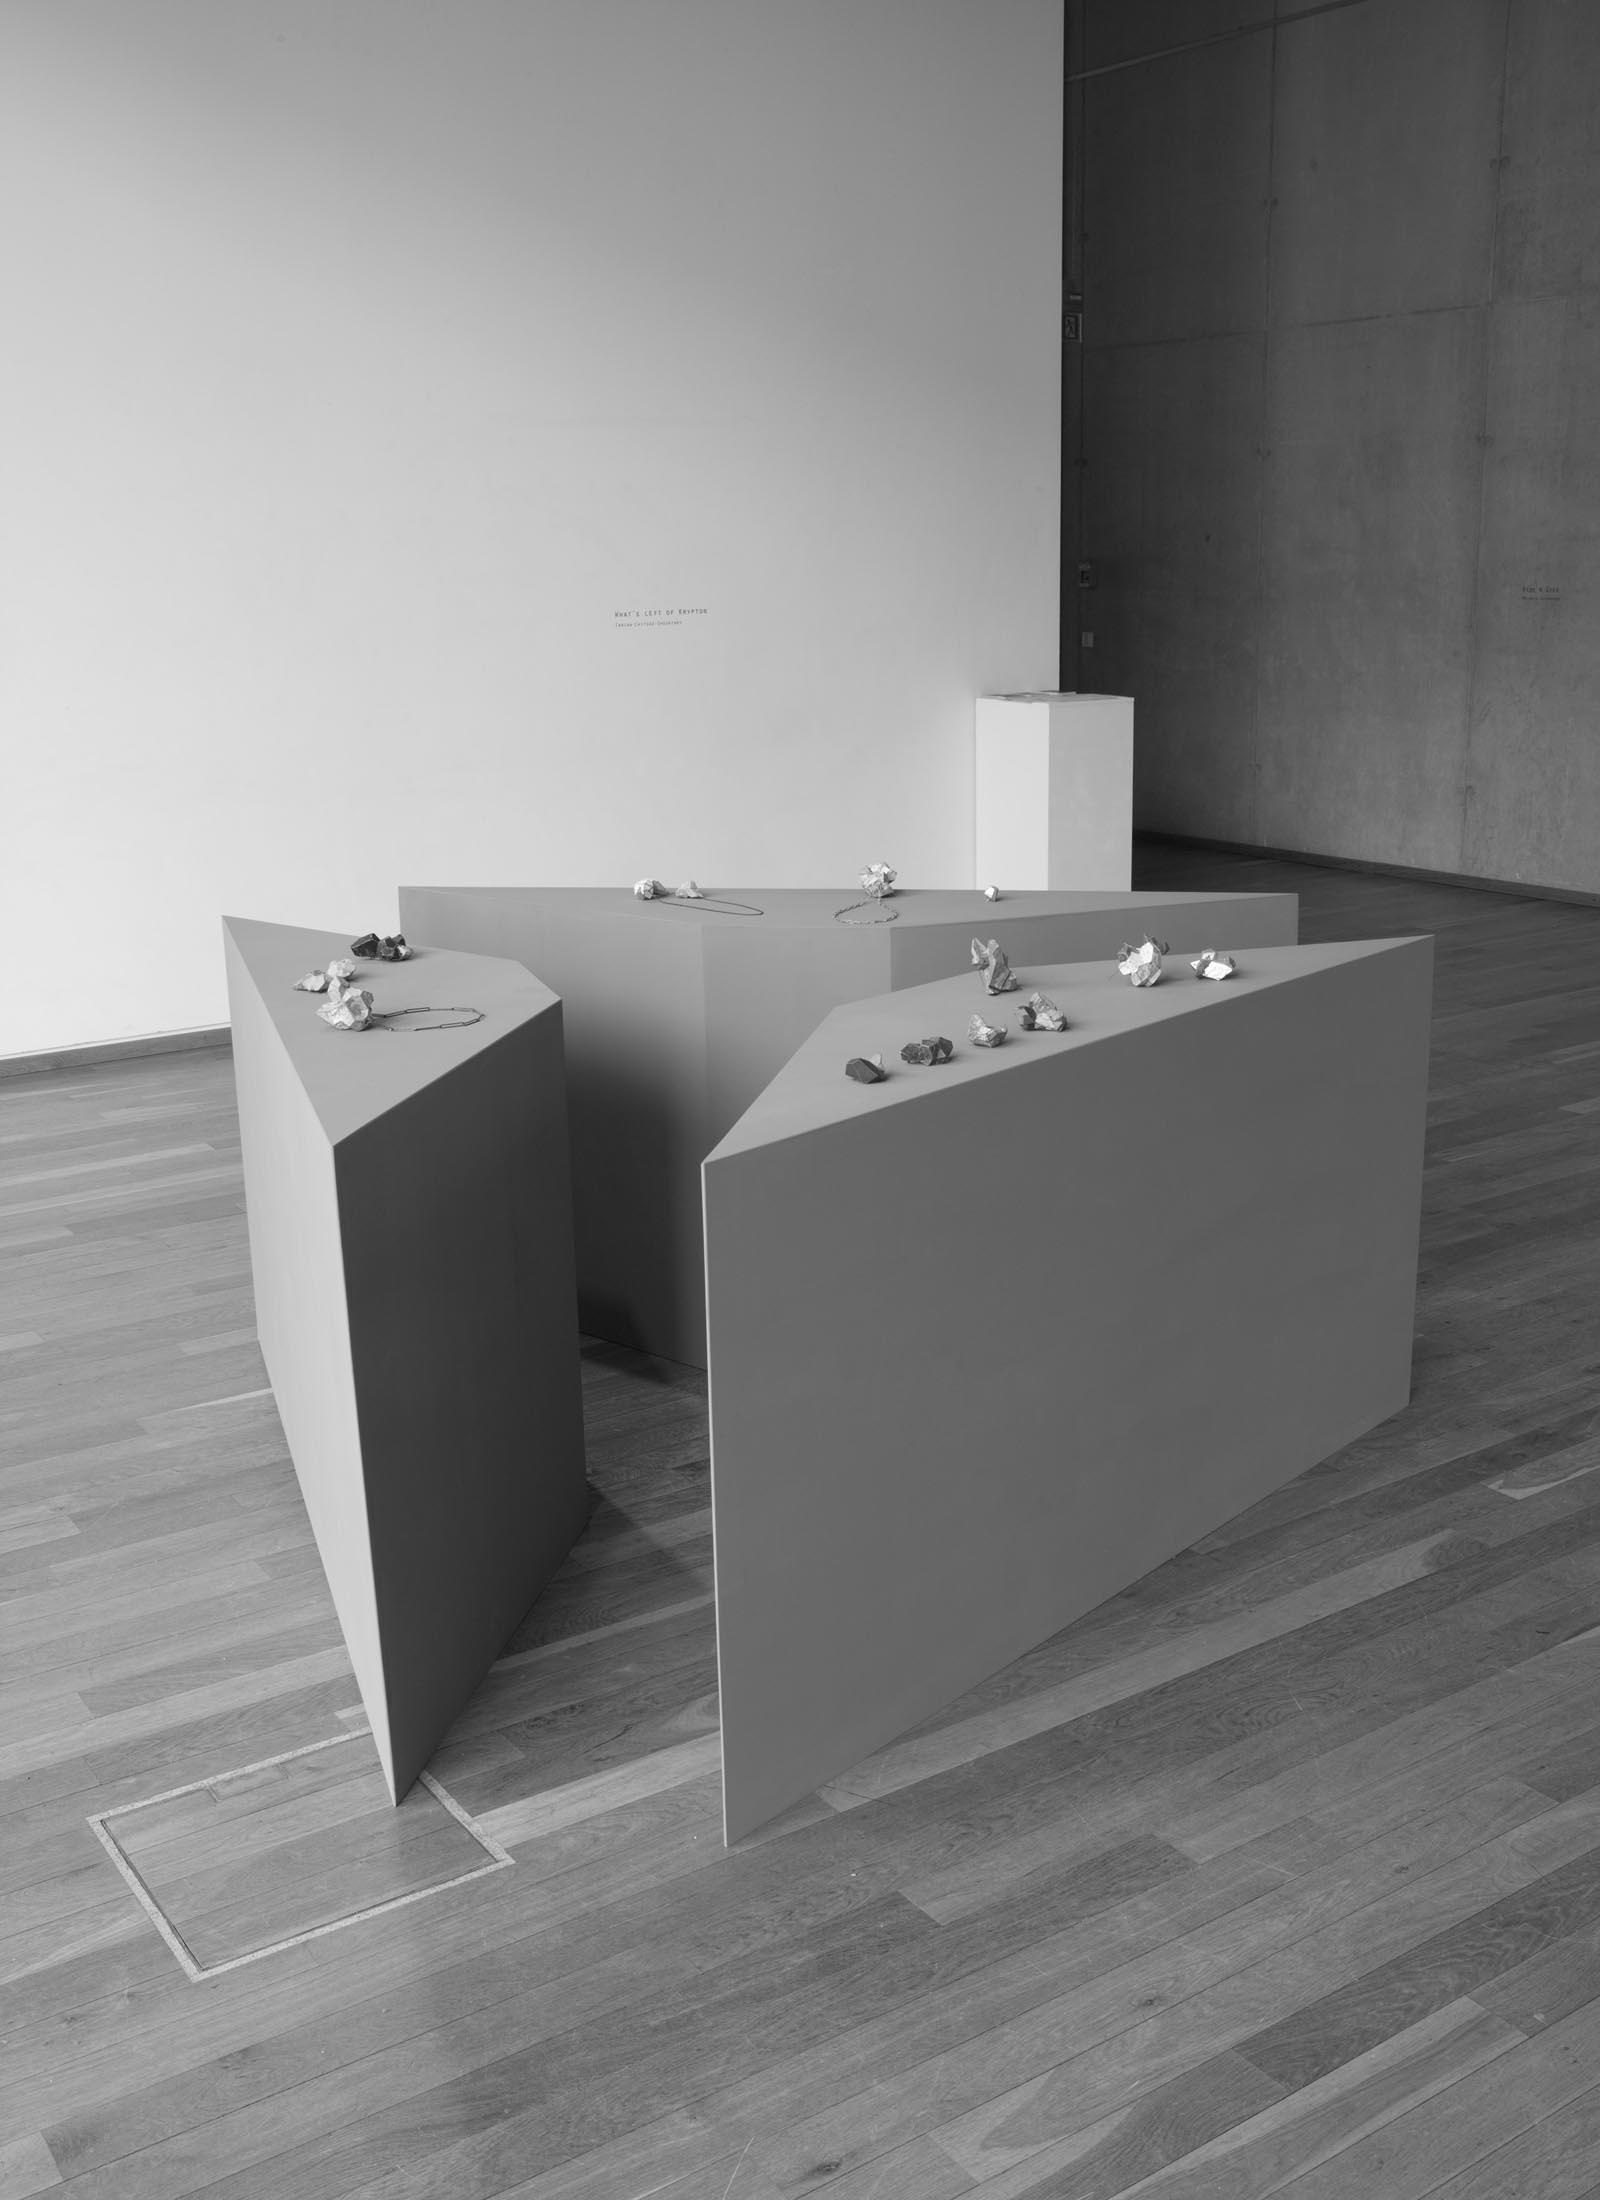 """What's Left of Krypton"" I The diploma show of Carina Shoshtary I 2012 I Academy of Fine Arts, Munich, Germany I Photo: Mirei Takeuchi"